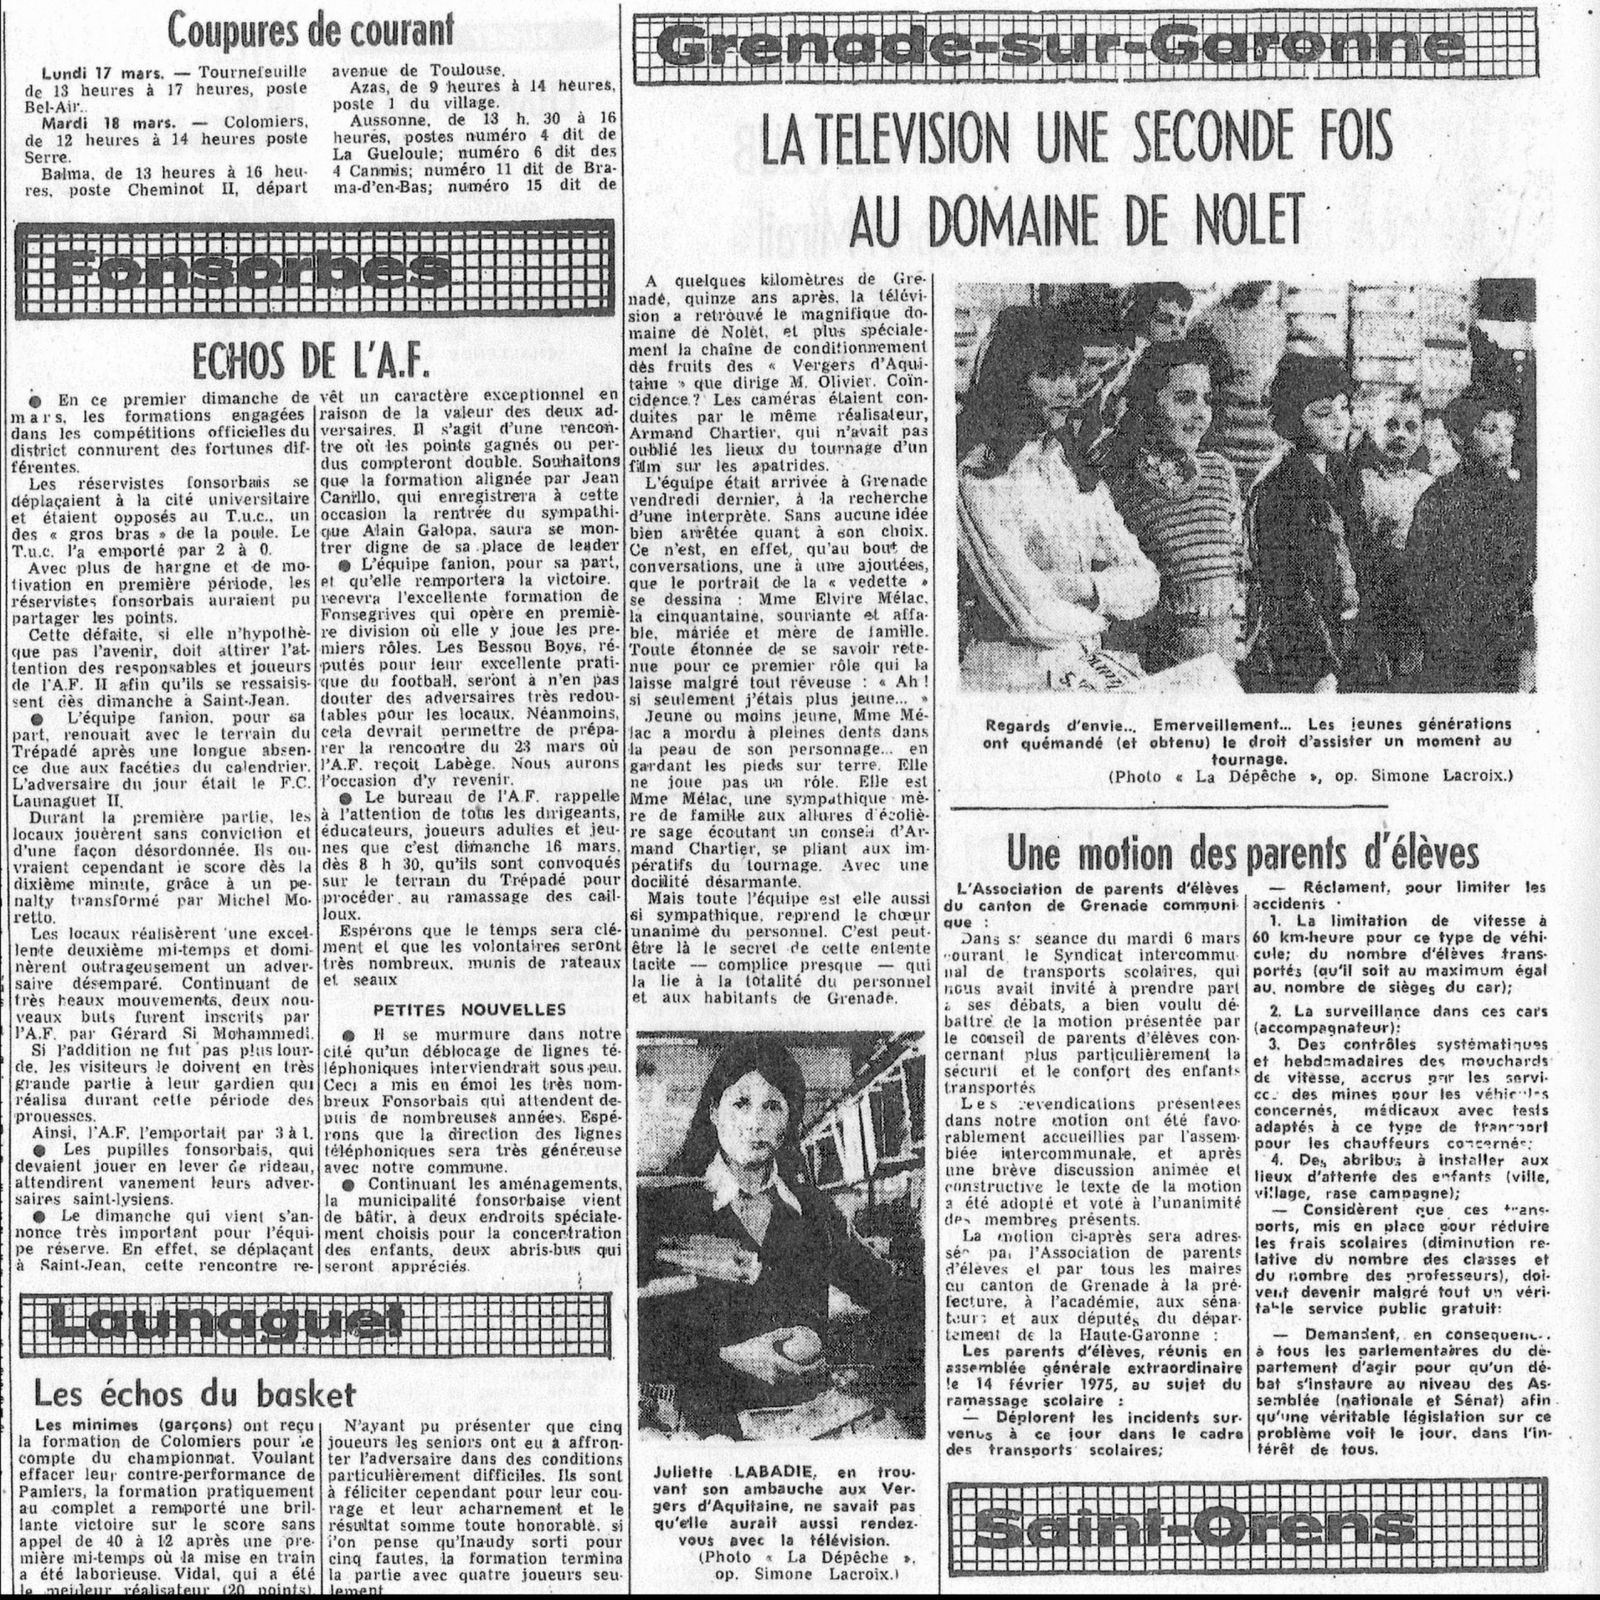 article de presse de 1975